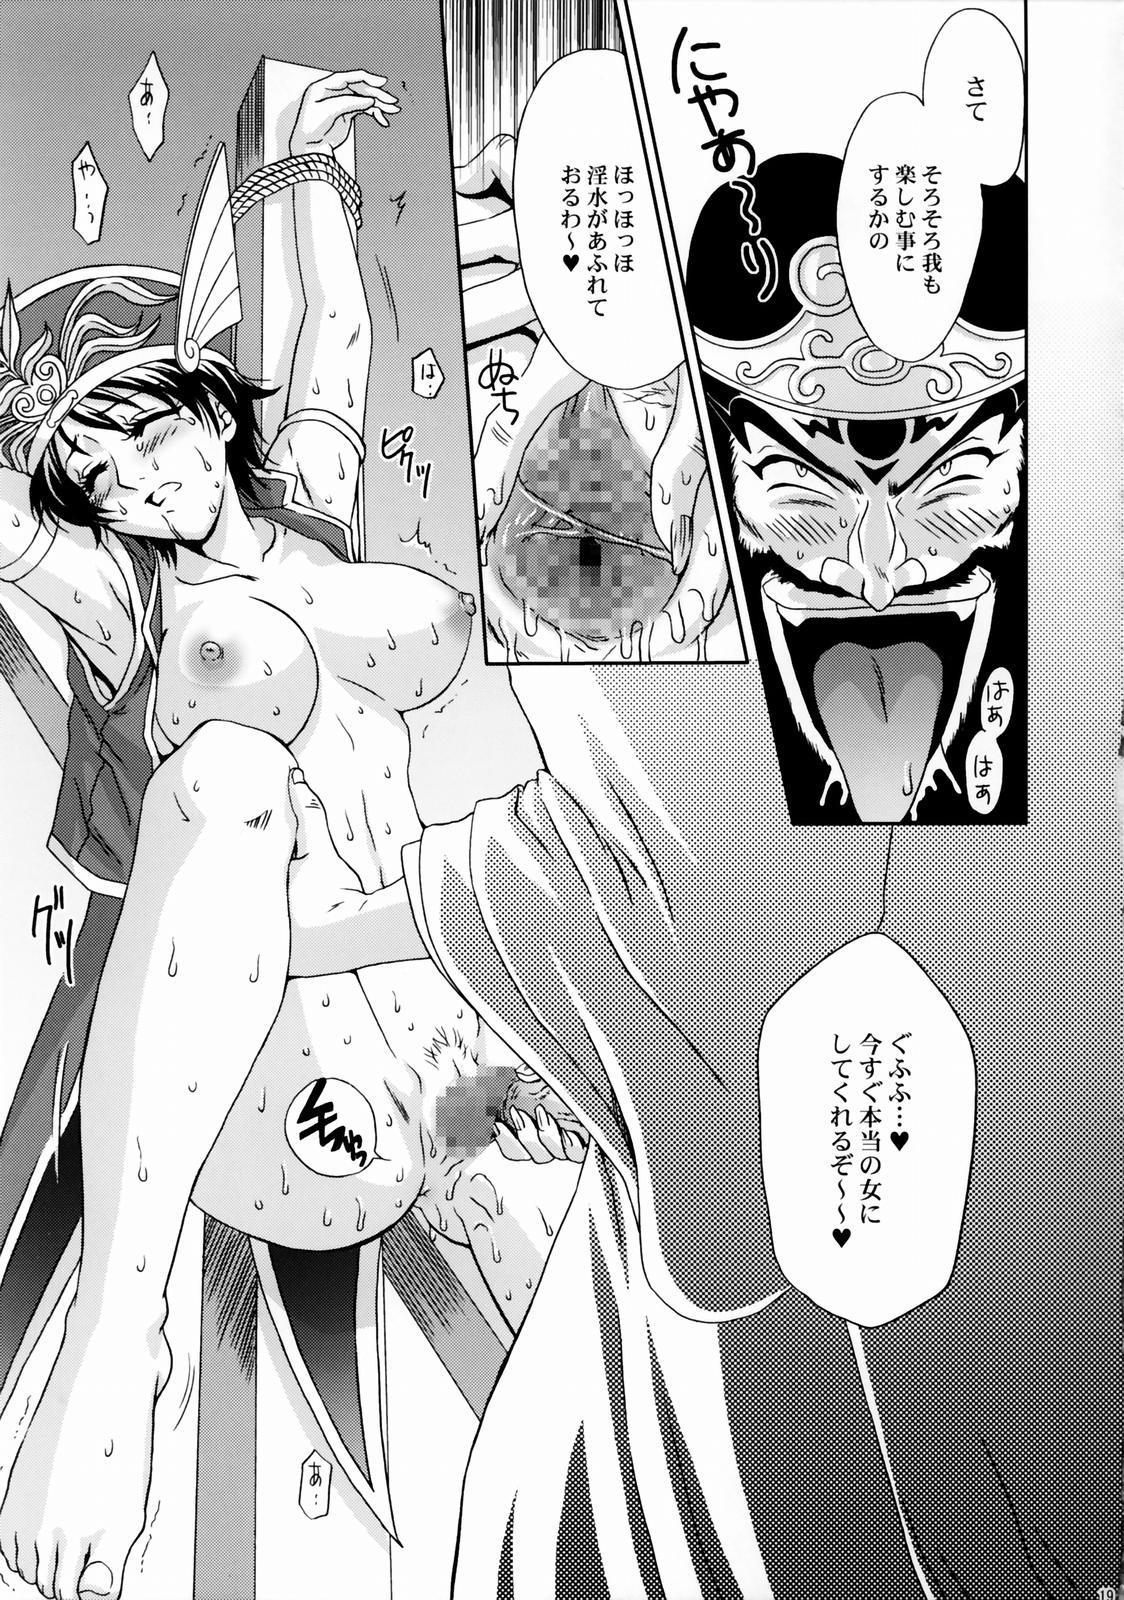 In Sangoku Musou Rikuson Gaiden 17